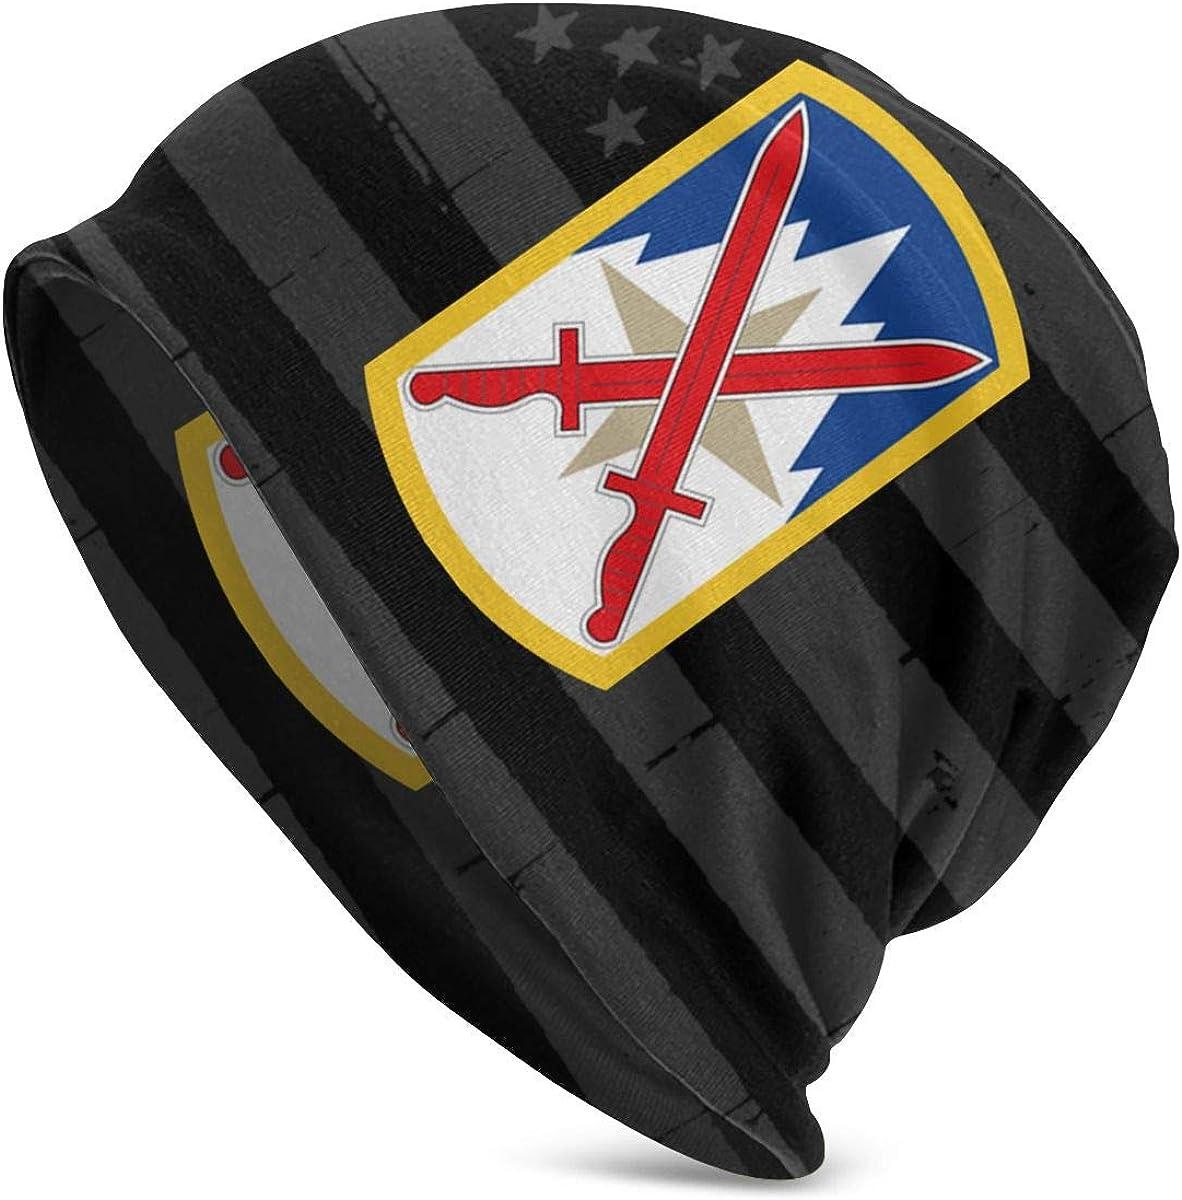 JINGUImao US Army 10th Sustainment Brigade 10th Mountain Division Unisex Warm Hat Knit Hat Skull Cap Beanies Cap